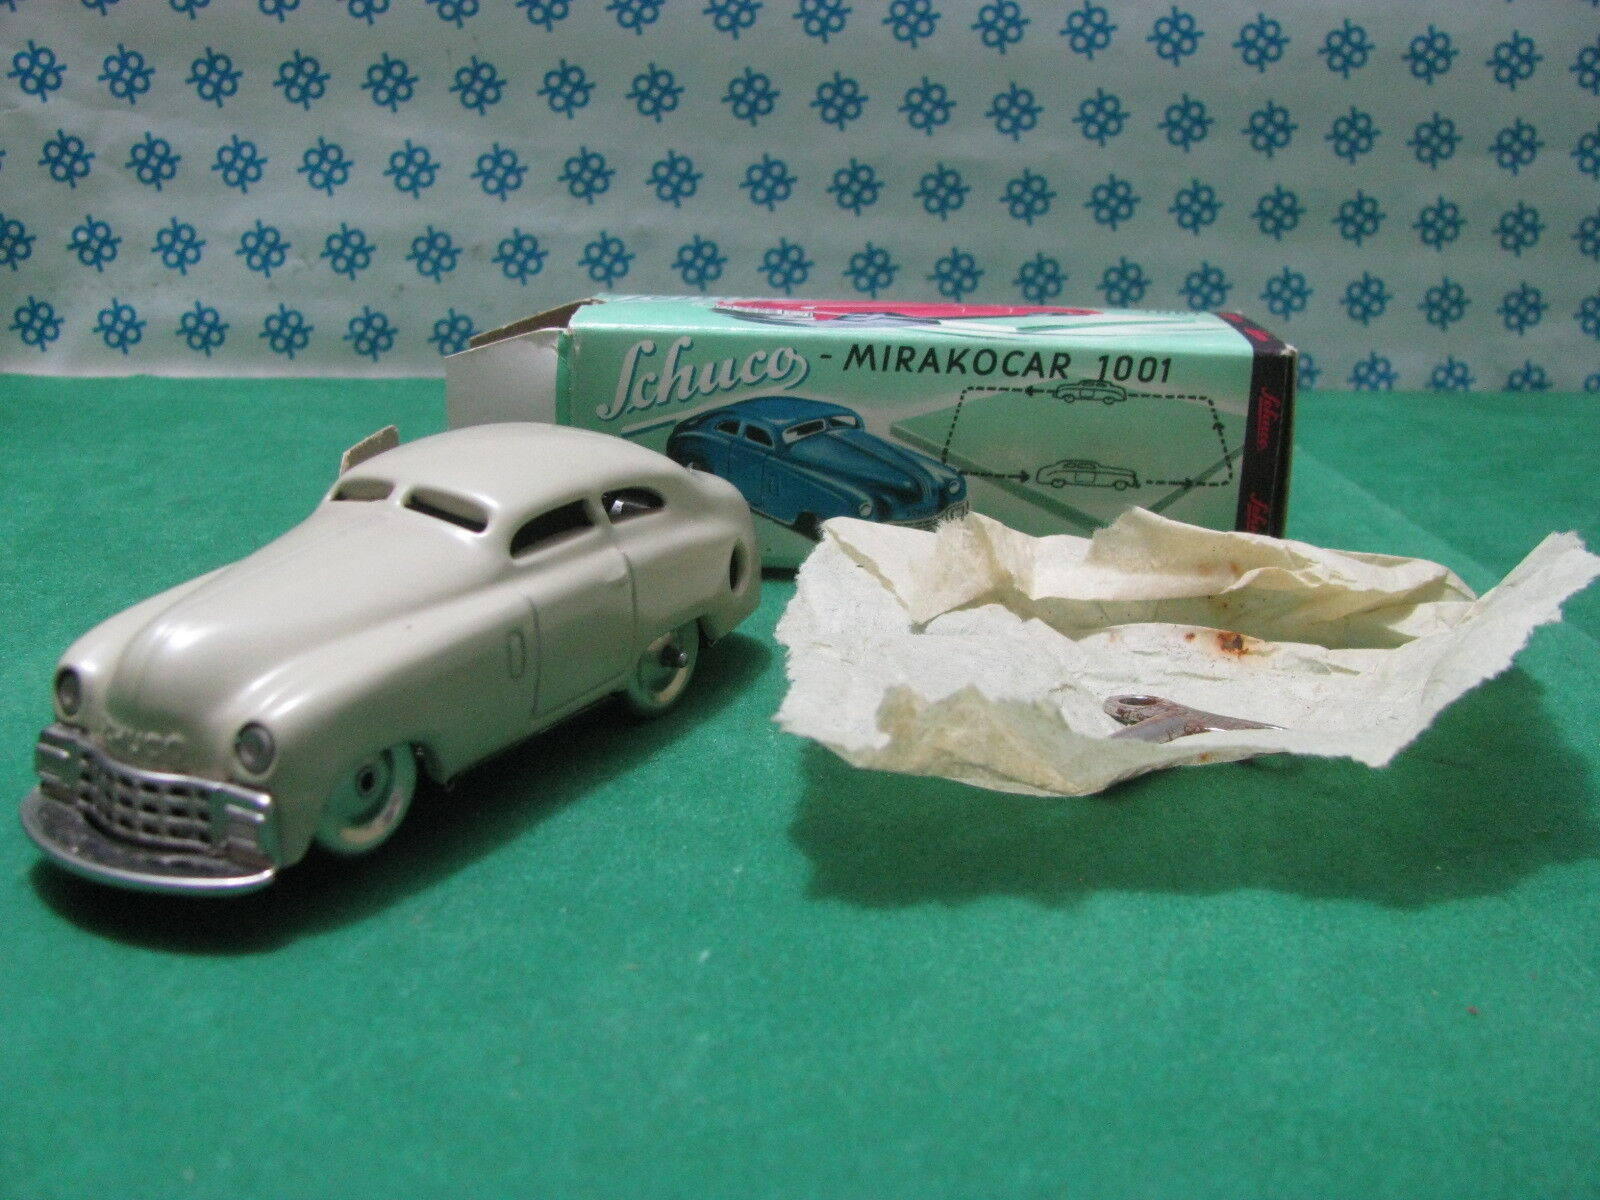 Vintage Tin Toy Schuco Mirakocar 1001 - Western Germany Anni 50 -